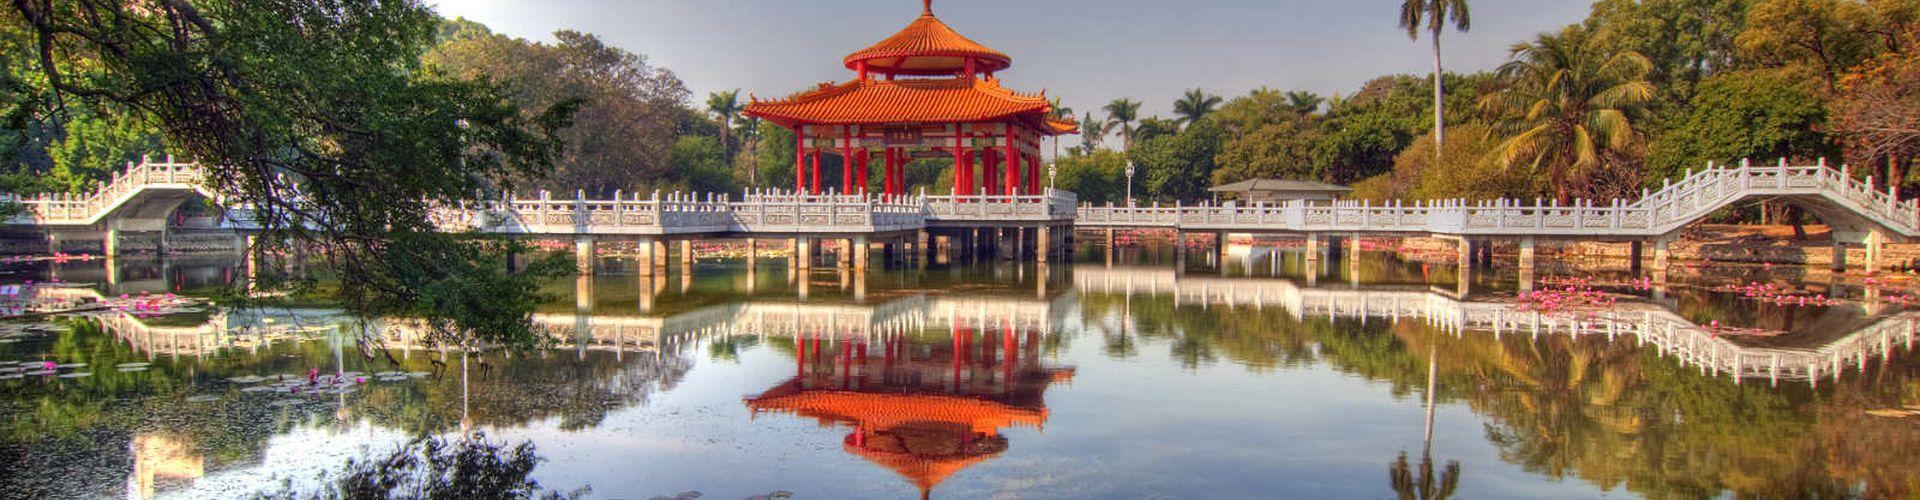 10 fantastische Radtouren in Taiwan